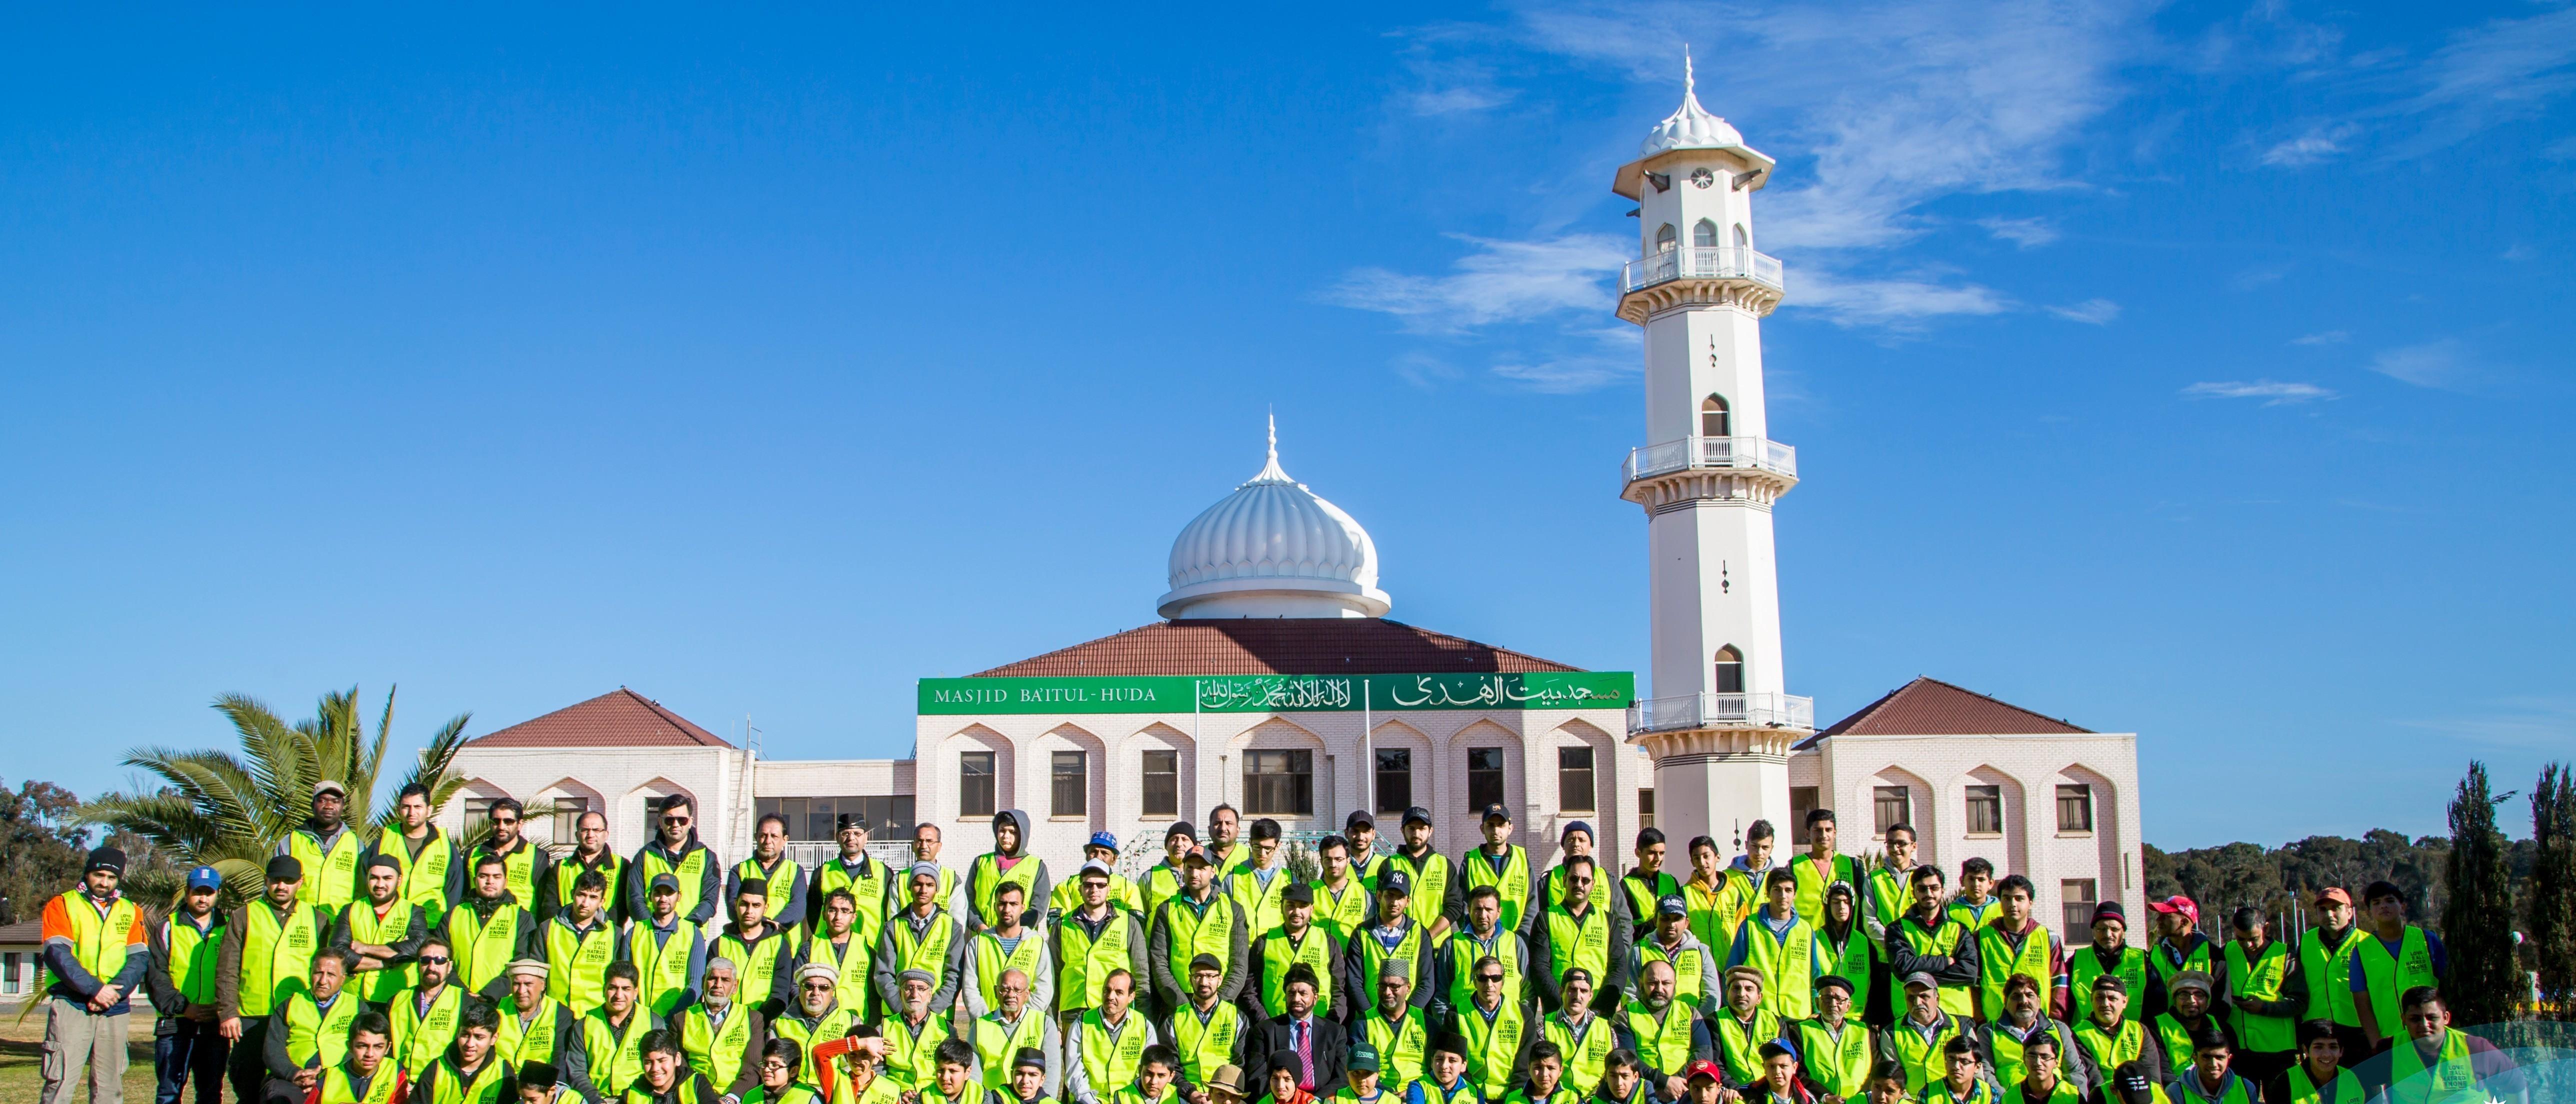 Ahmadi Muslims NSW - Marsden Park (Park Central) Campbelltown